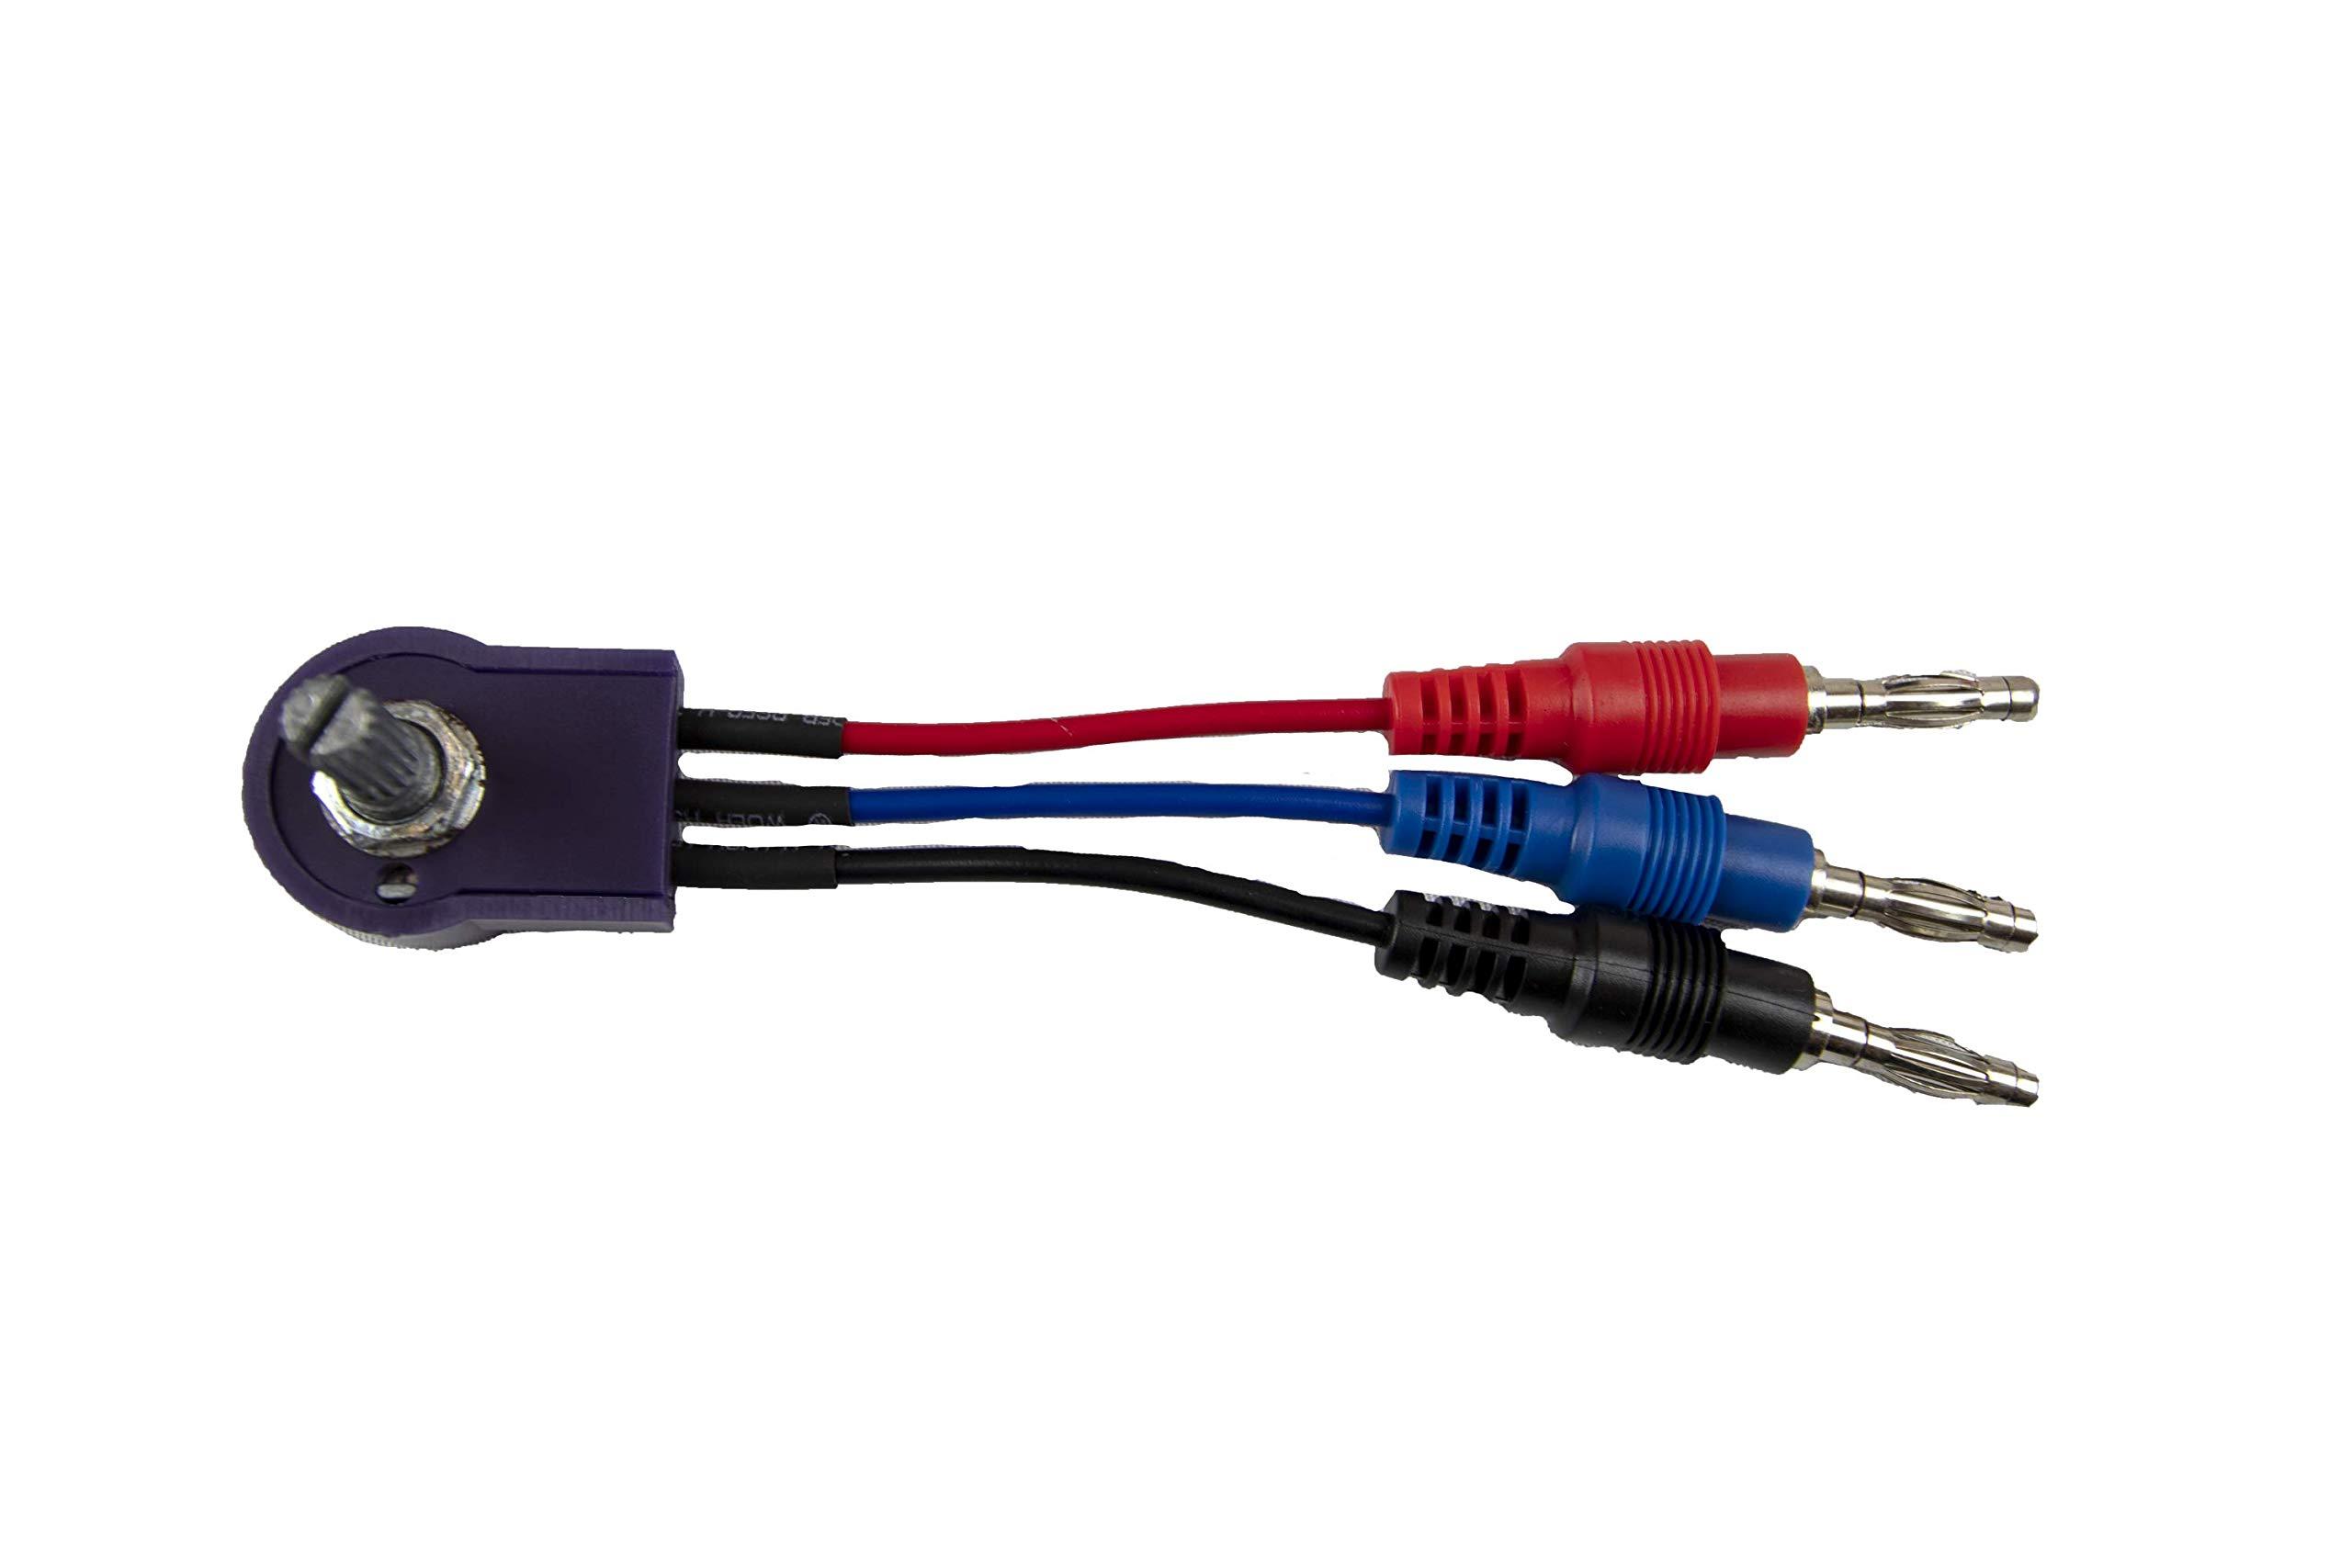 Diesel Laptops 94 Piece Electrical Diagnostic Terminal Test Kit by Diesel Laptops (Image #8)